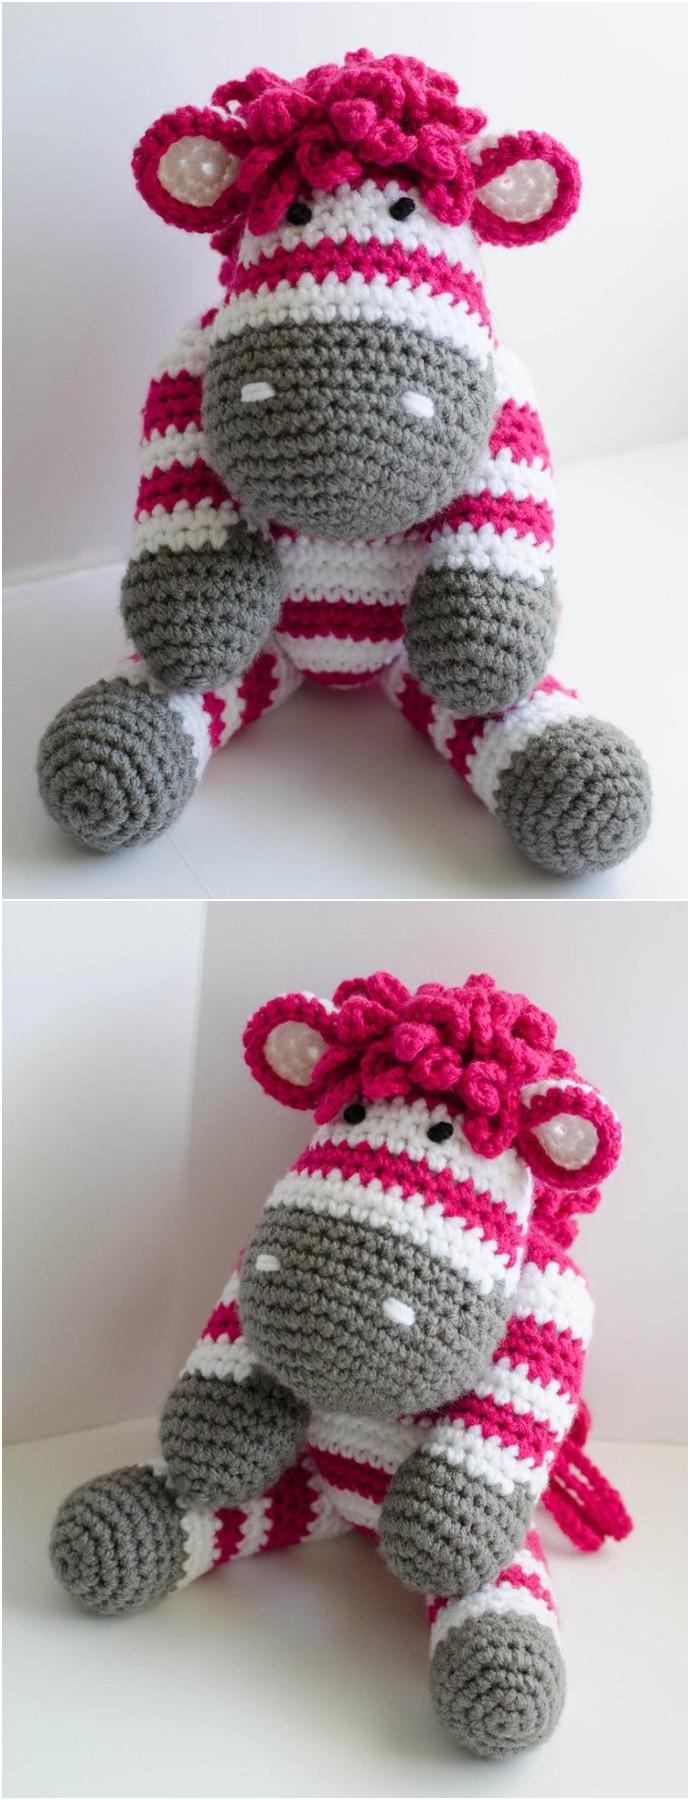 Amigurumi Crochet Zebra Pattern